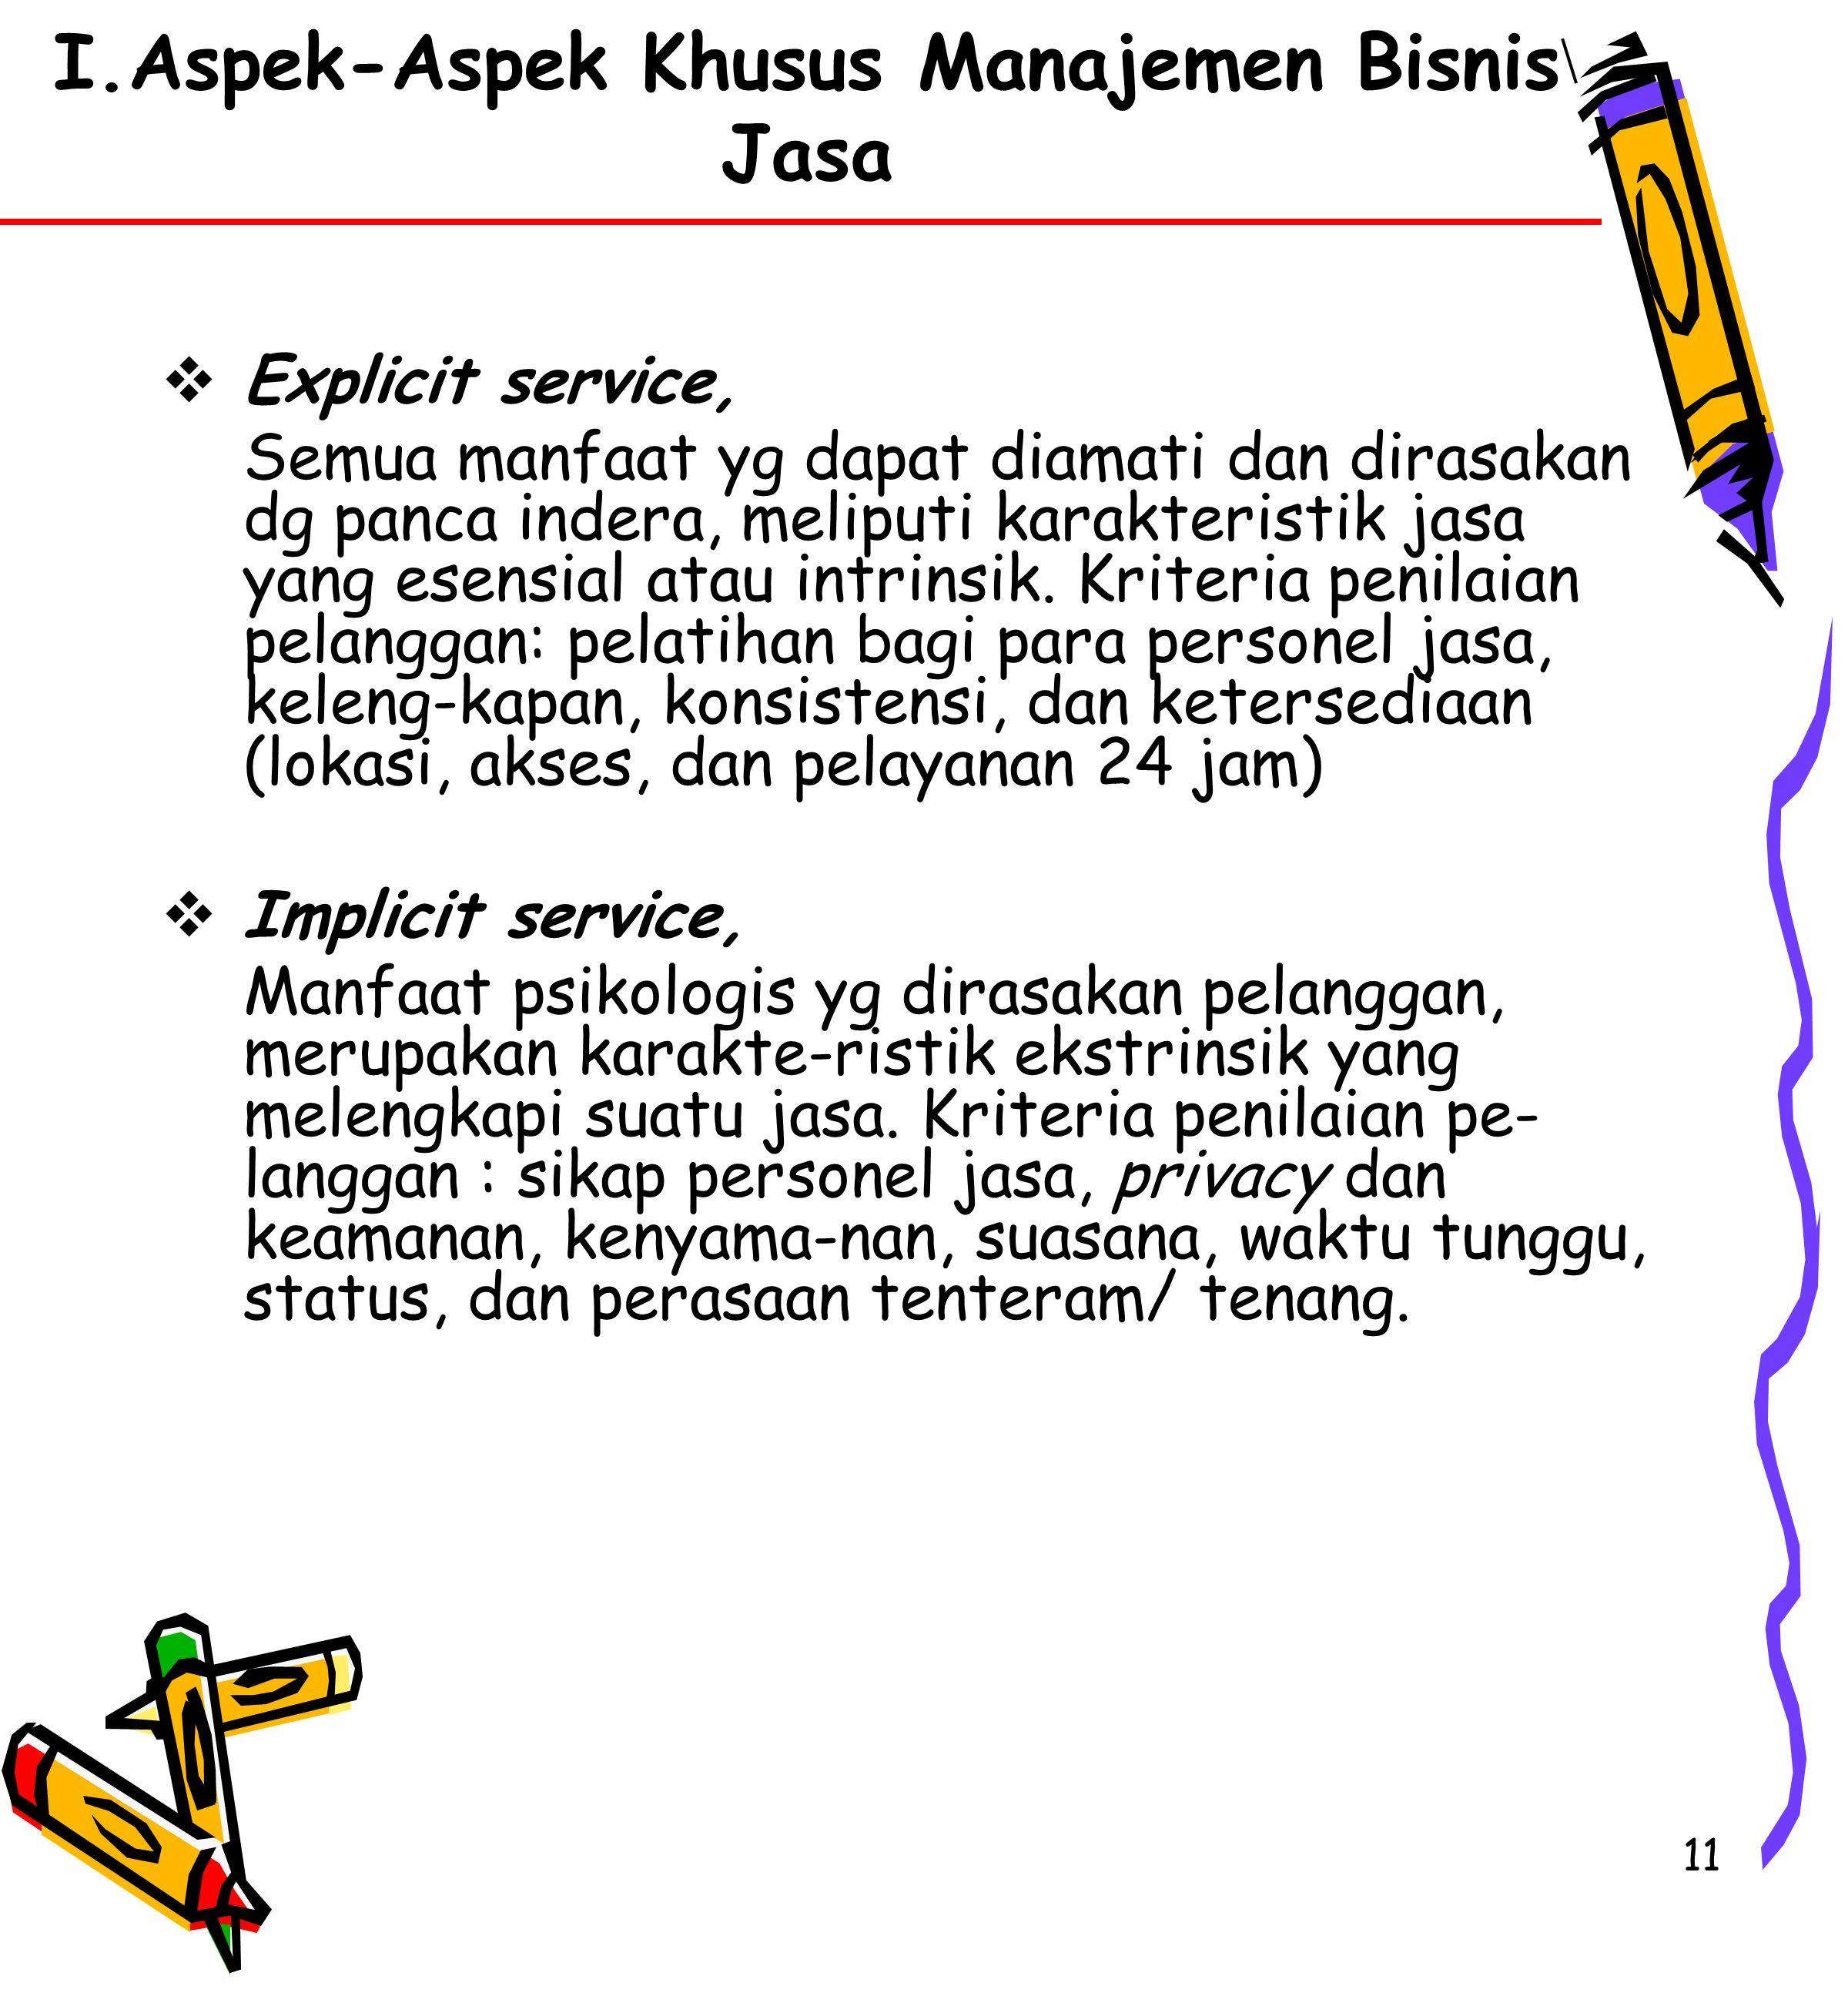 11  Explicit service, Semua manfaat yg dapat diamati dan dirasakan dg panca indera, meliputi karakteristik jasa yang esensial atau intrinsik.